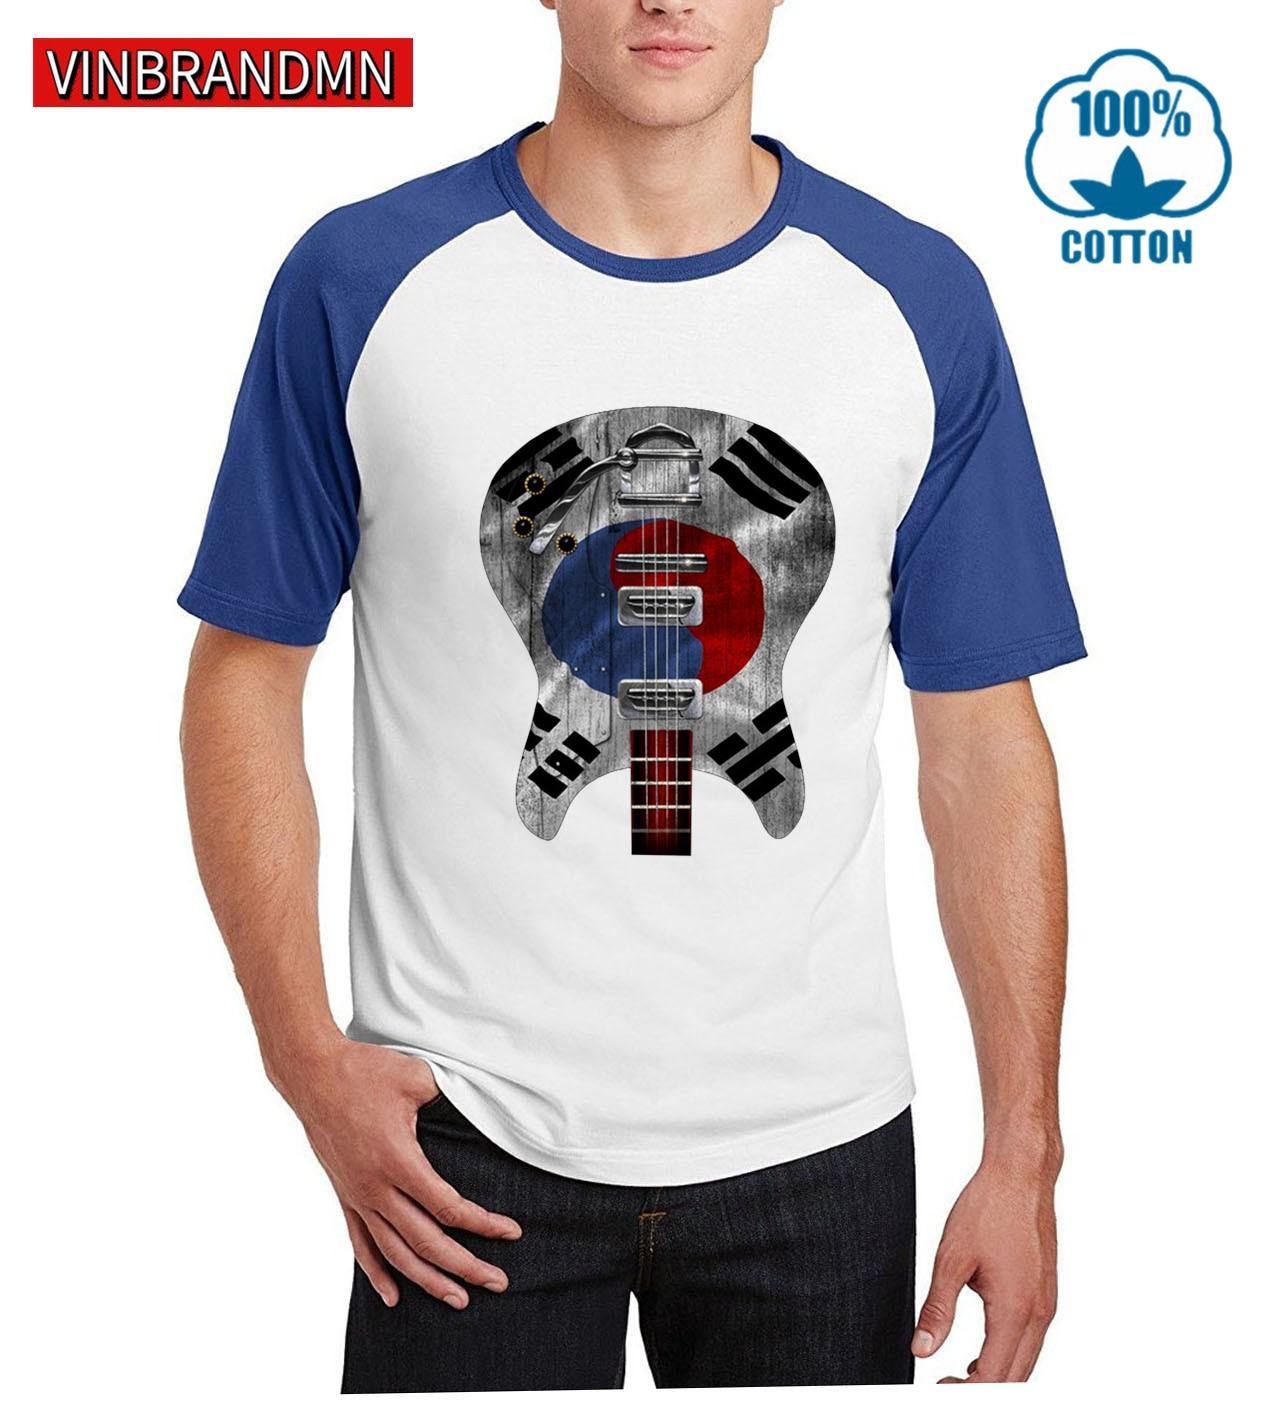 Camiseta de guitarra con bandera coreana para hombre, camisetas de moda de hip hop, camisetas de equipo nacional, camisetas de guitarra 100%, tops de algodón para reuniones, camisetas hipster 3D para fans